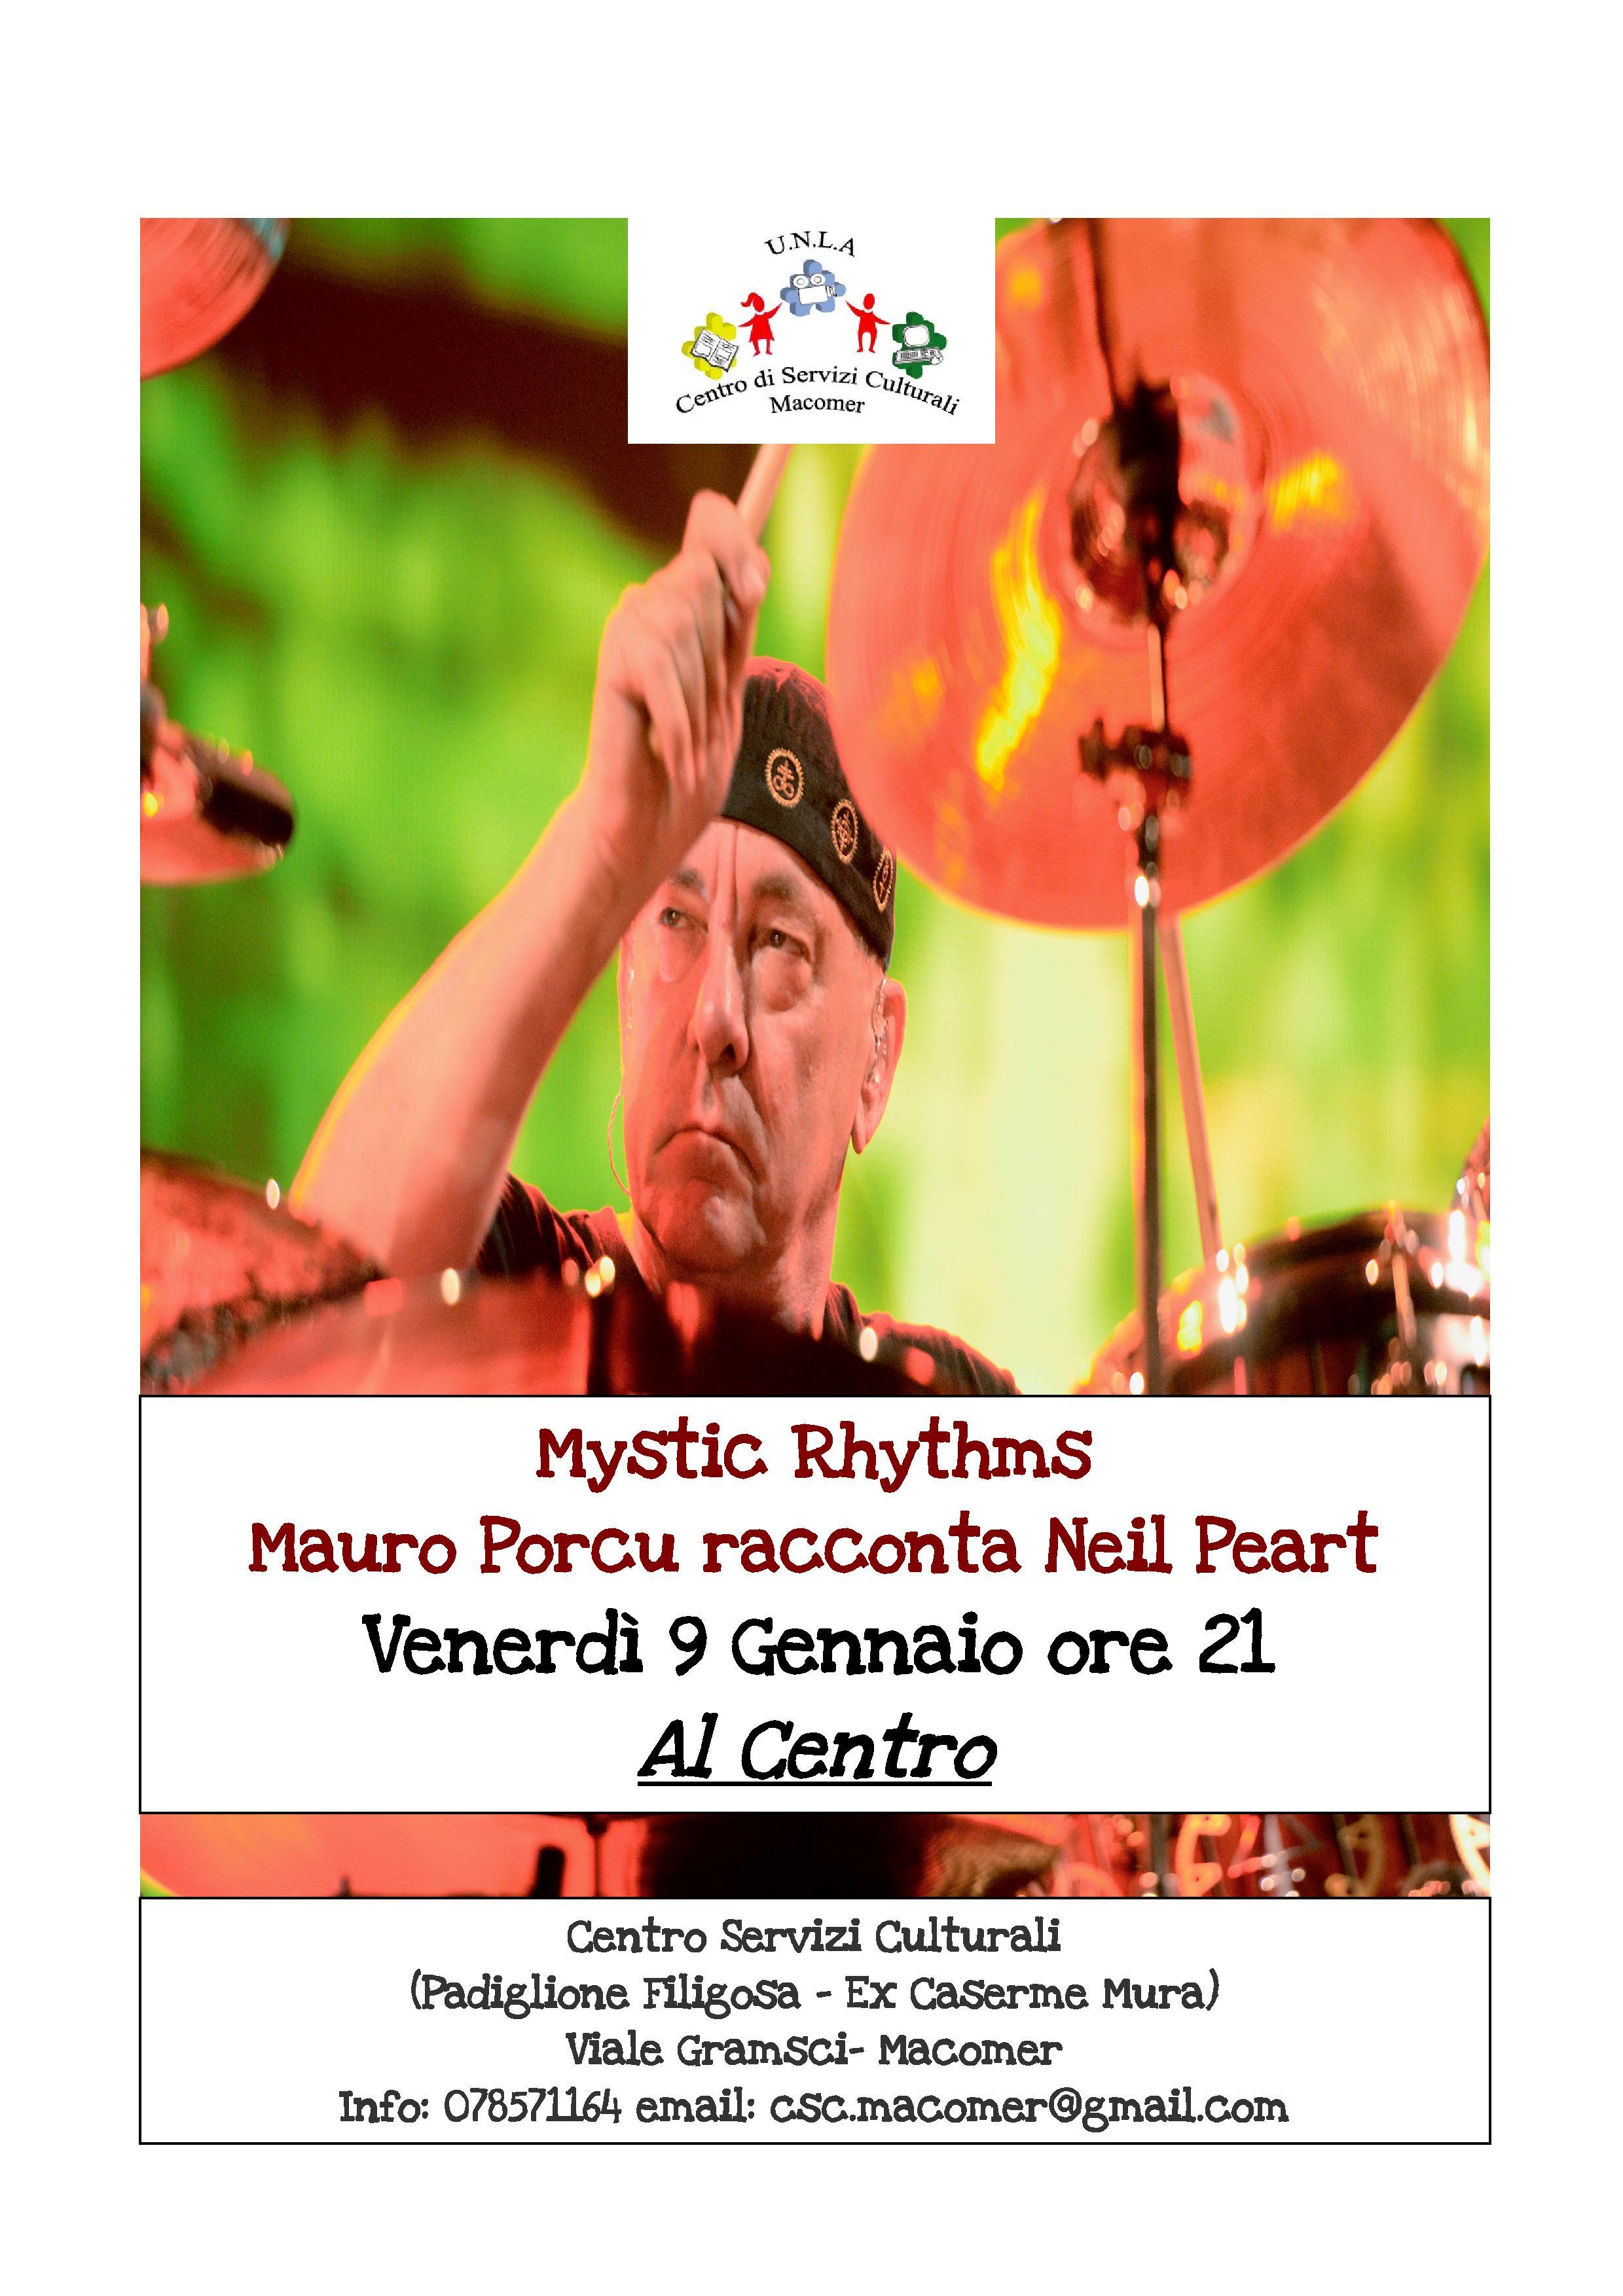 """Mystic Rhythms: Mauro Porcu racconta Neil Peart"" Venerdì 9 gennaio ore 21"